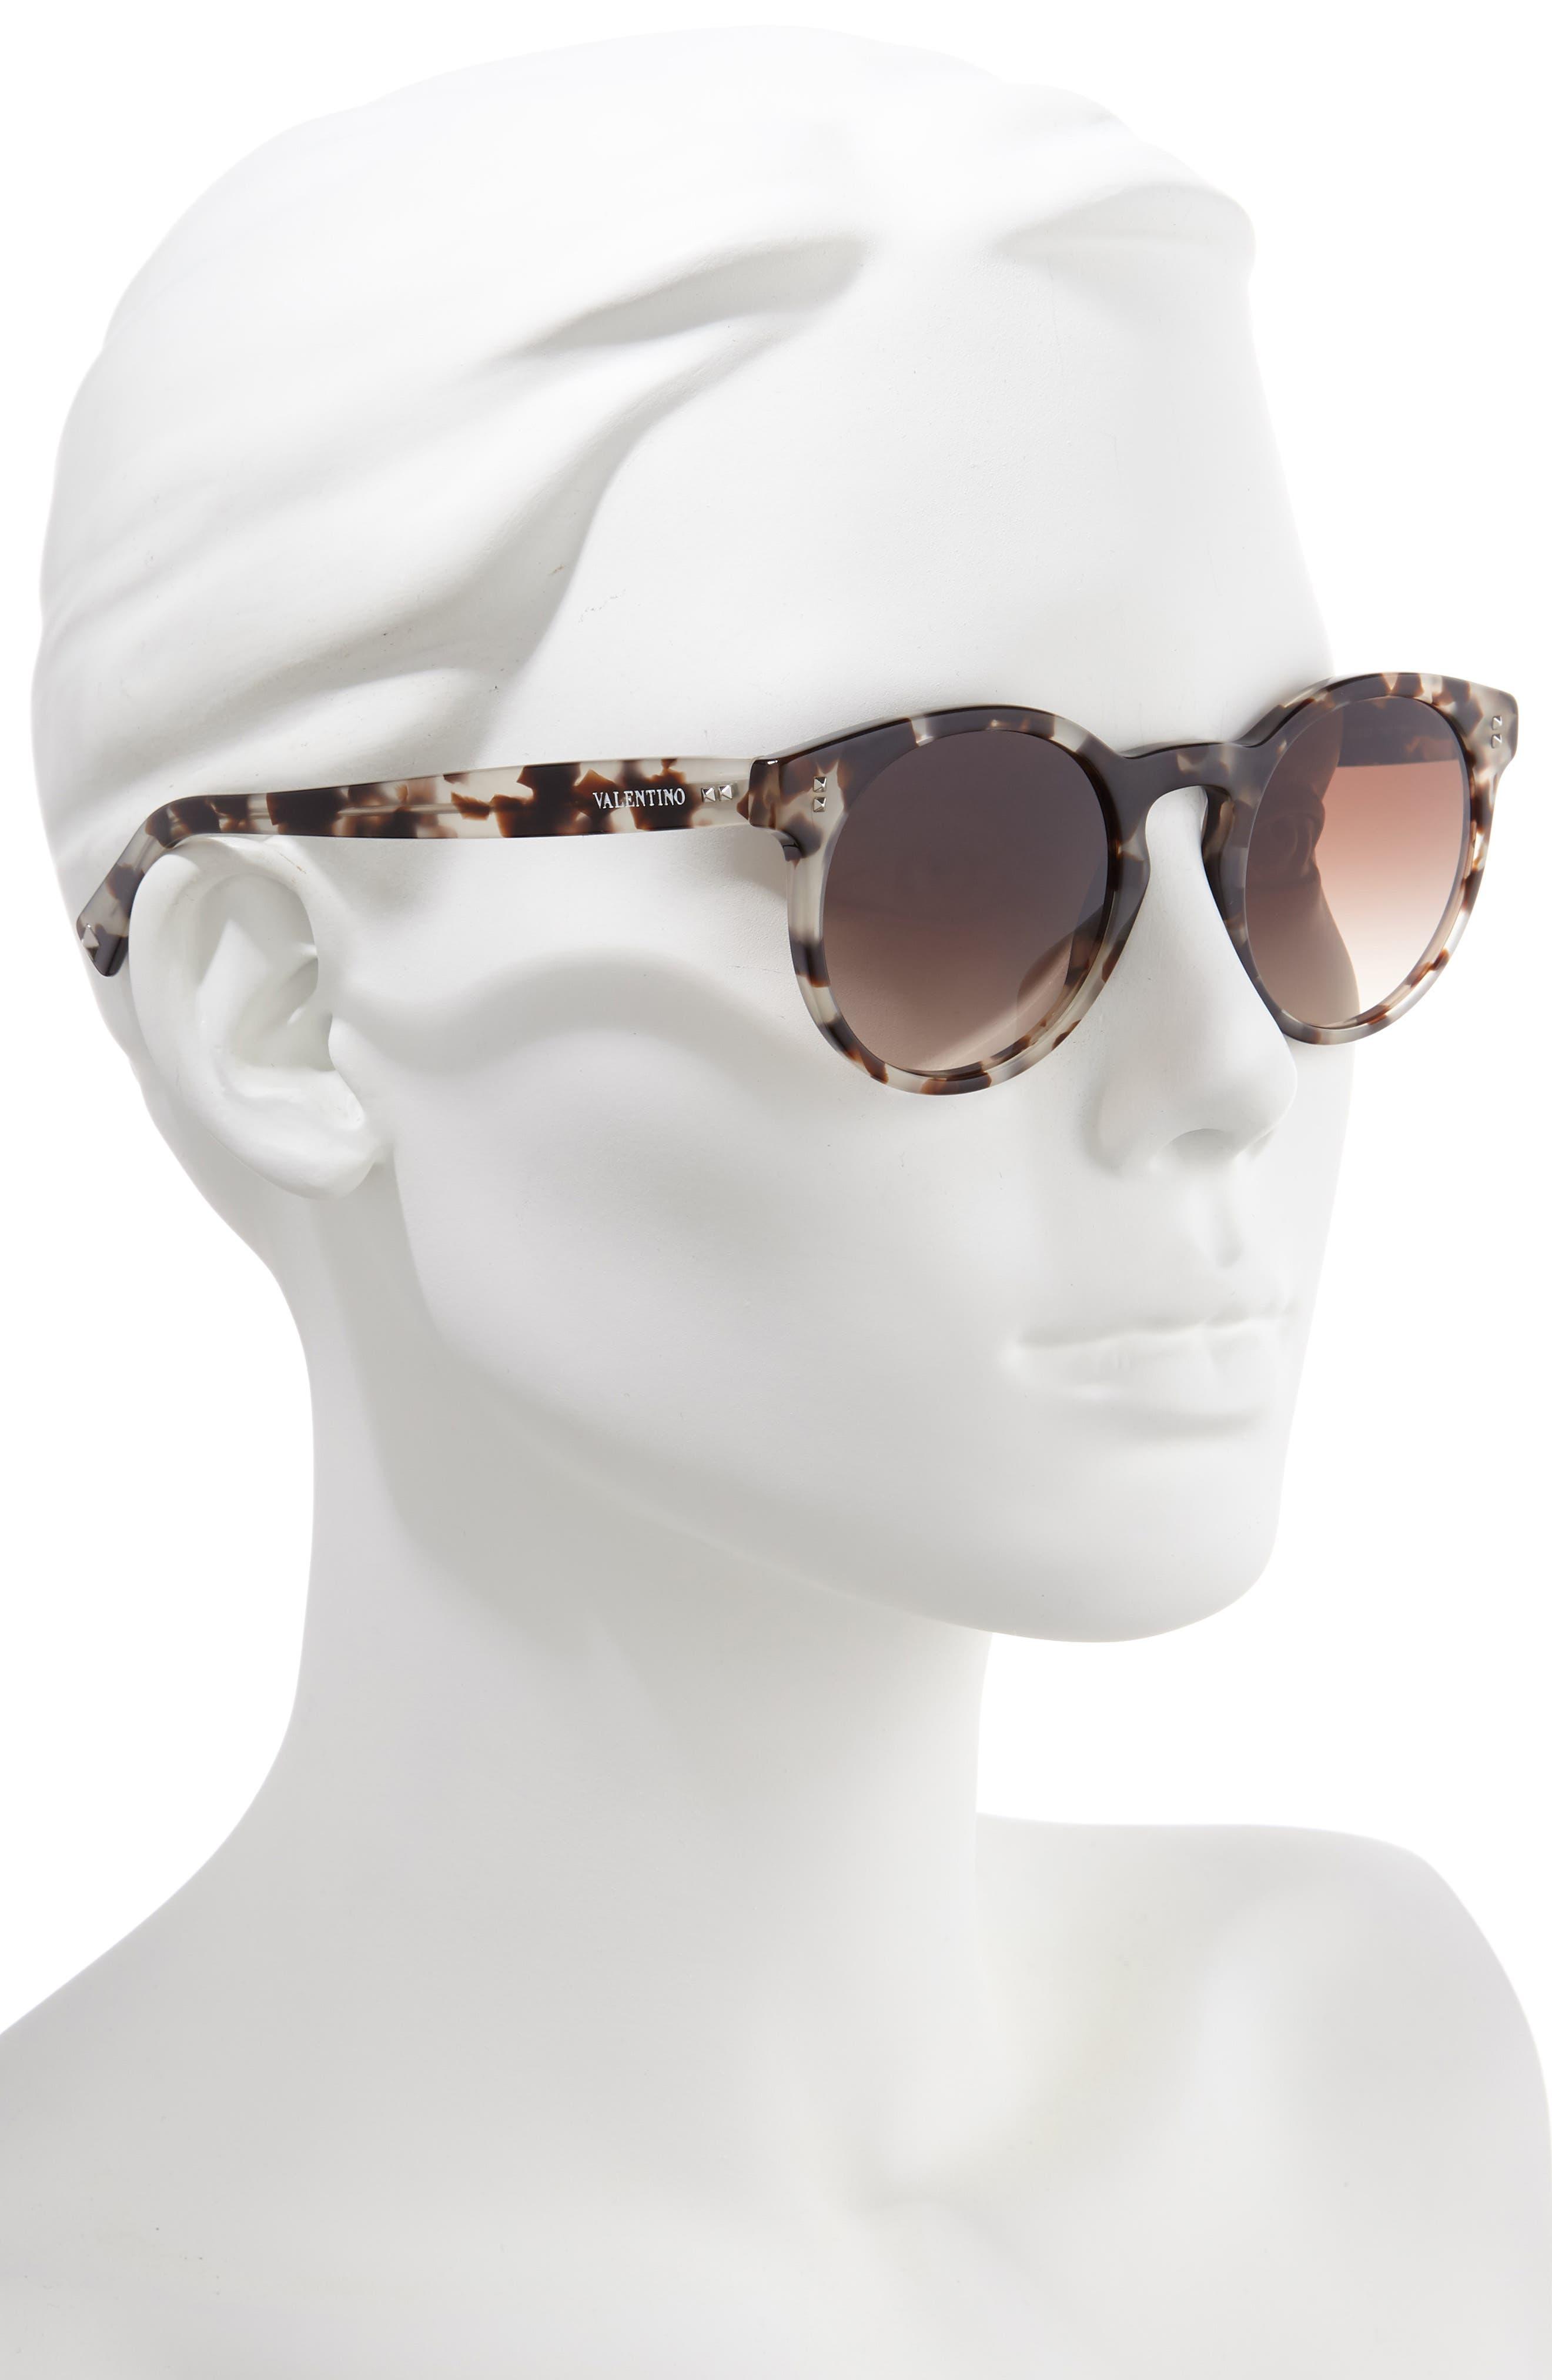 50mm Retro Sunglasses,                             Alternate thumbnail 2, color,                             BEIGE TORTOISE/ BROWN GRADIENT